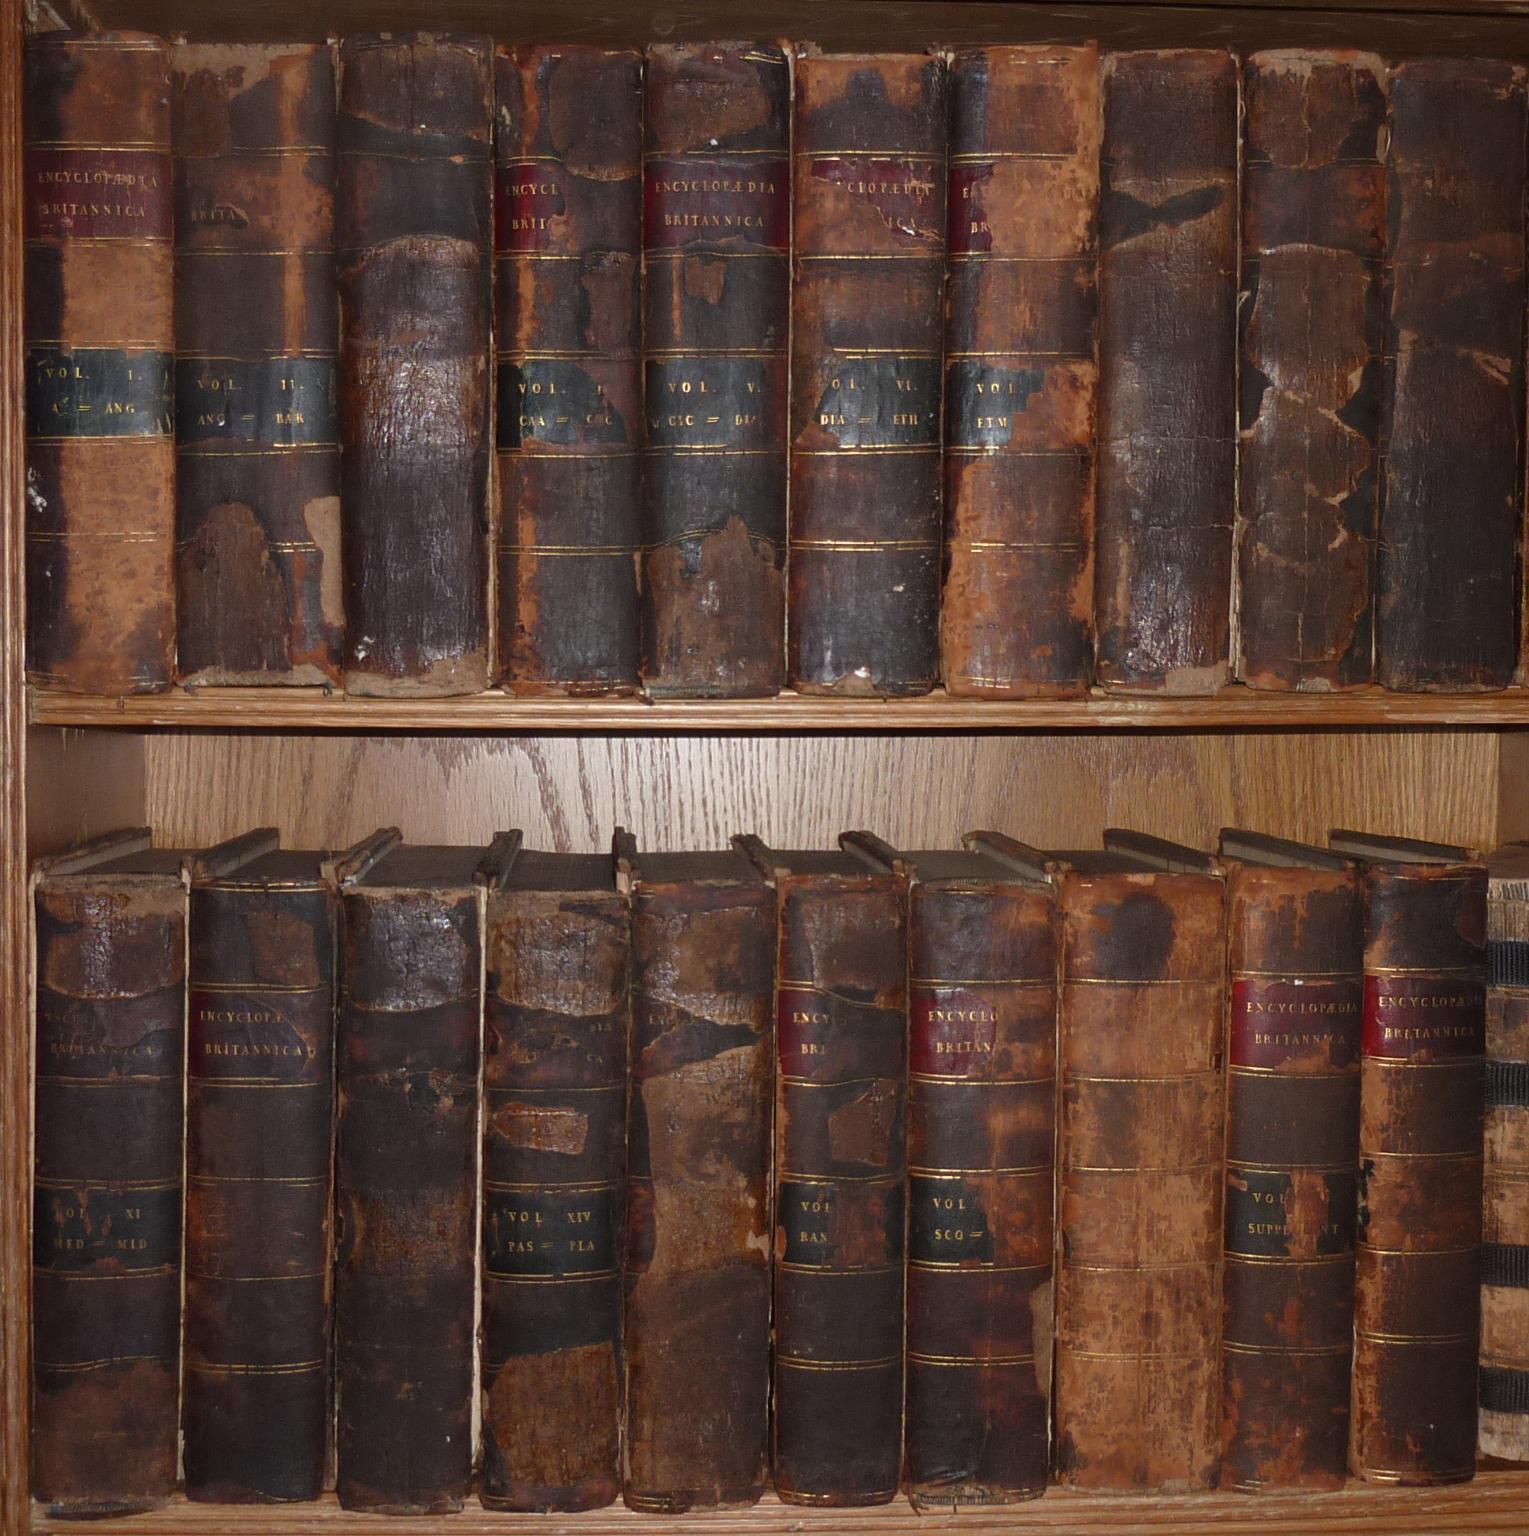 Encyclopædia Britannica, 3e édition (1797)